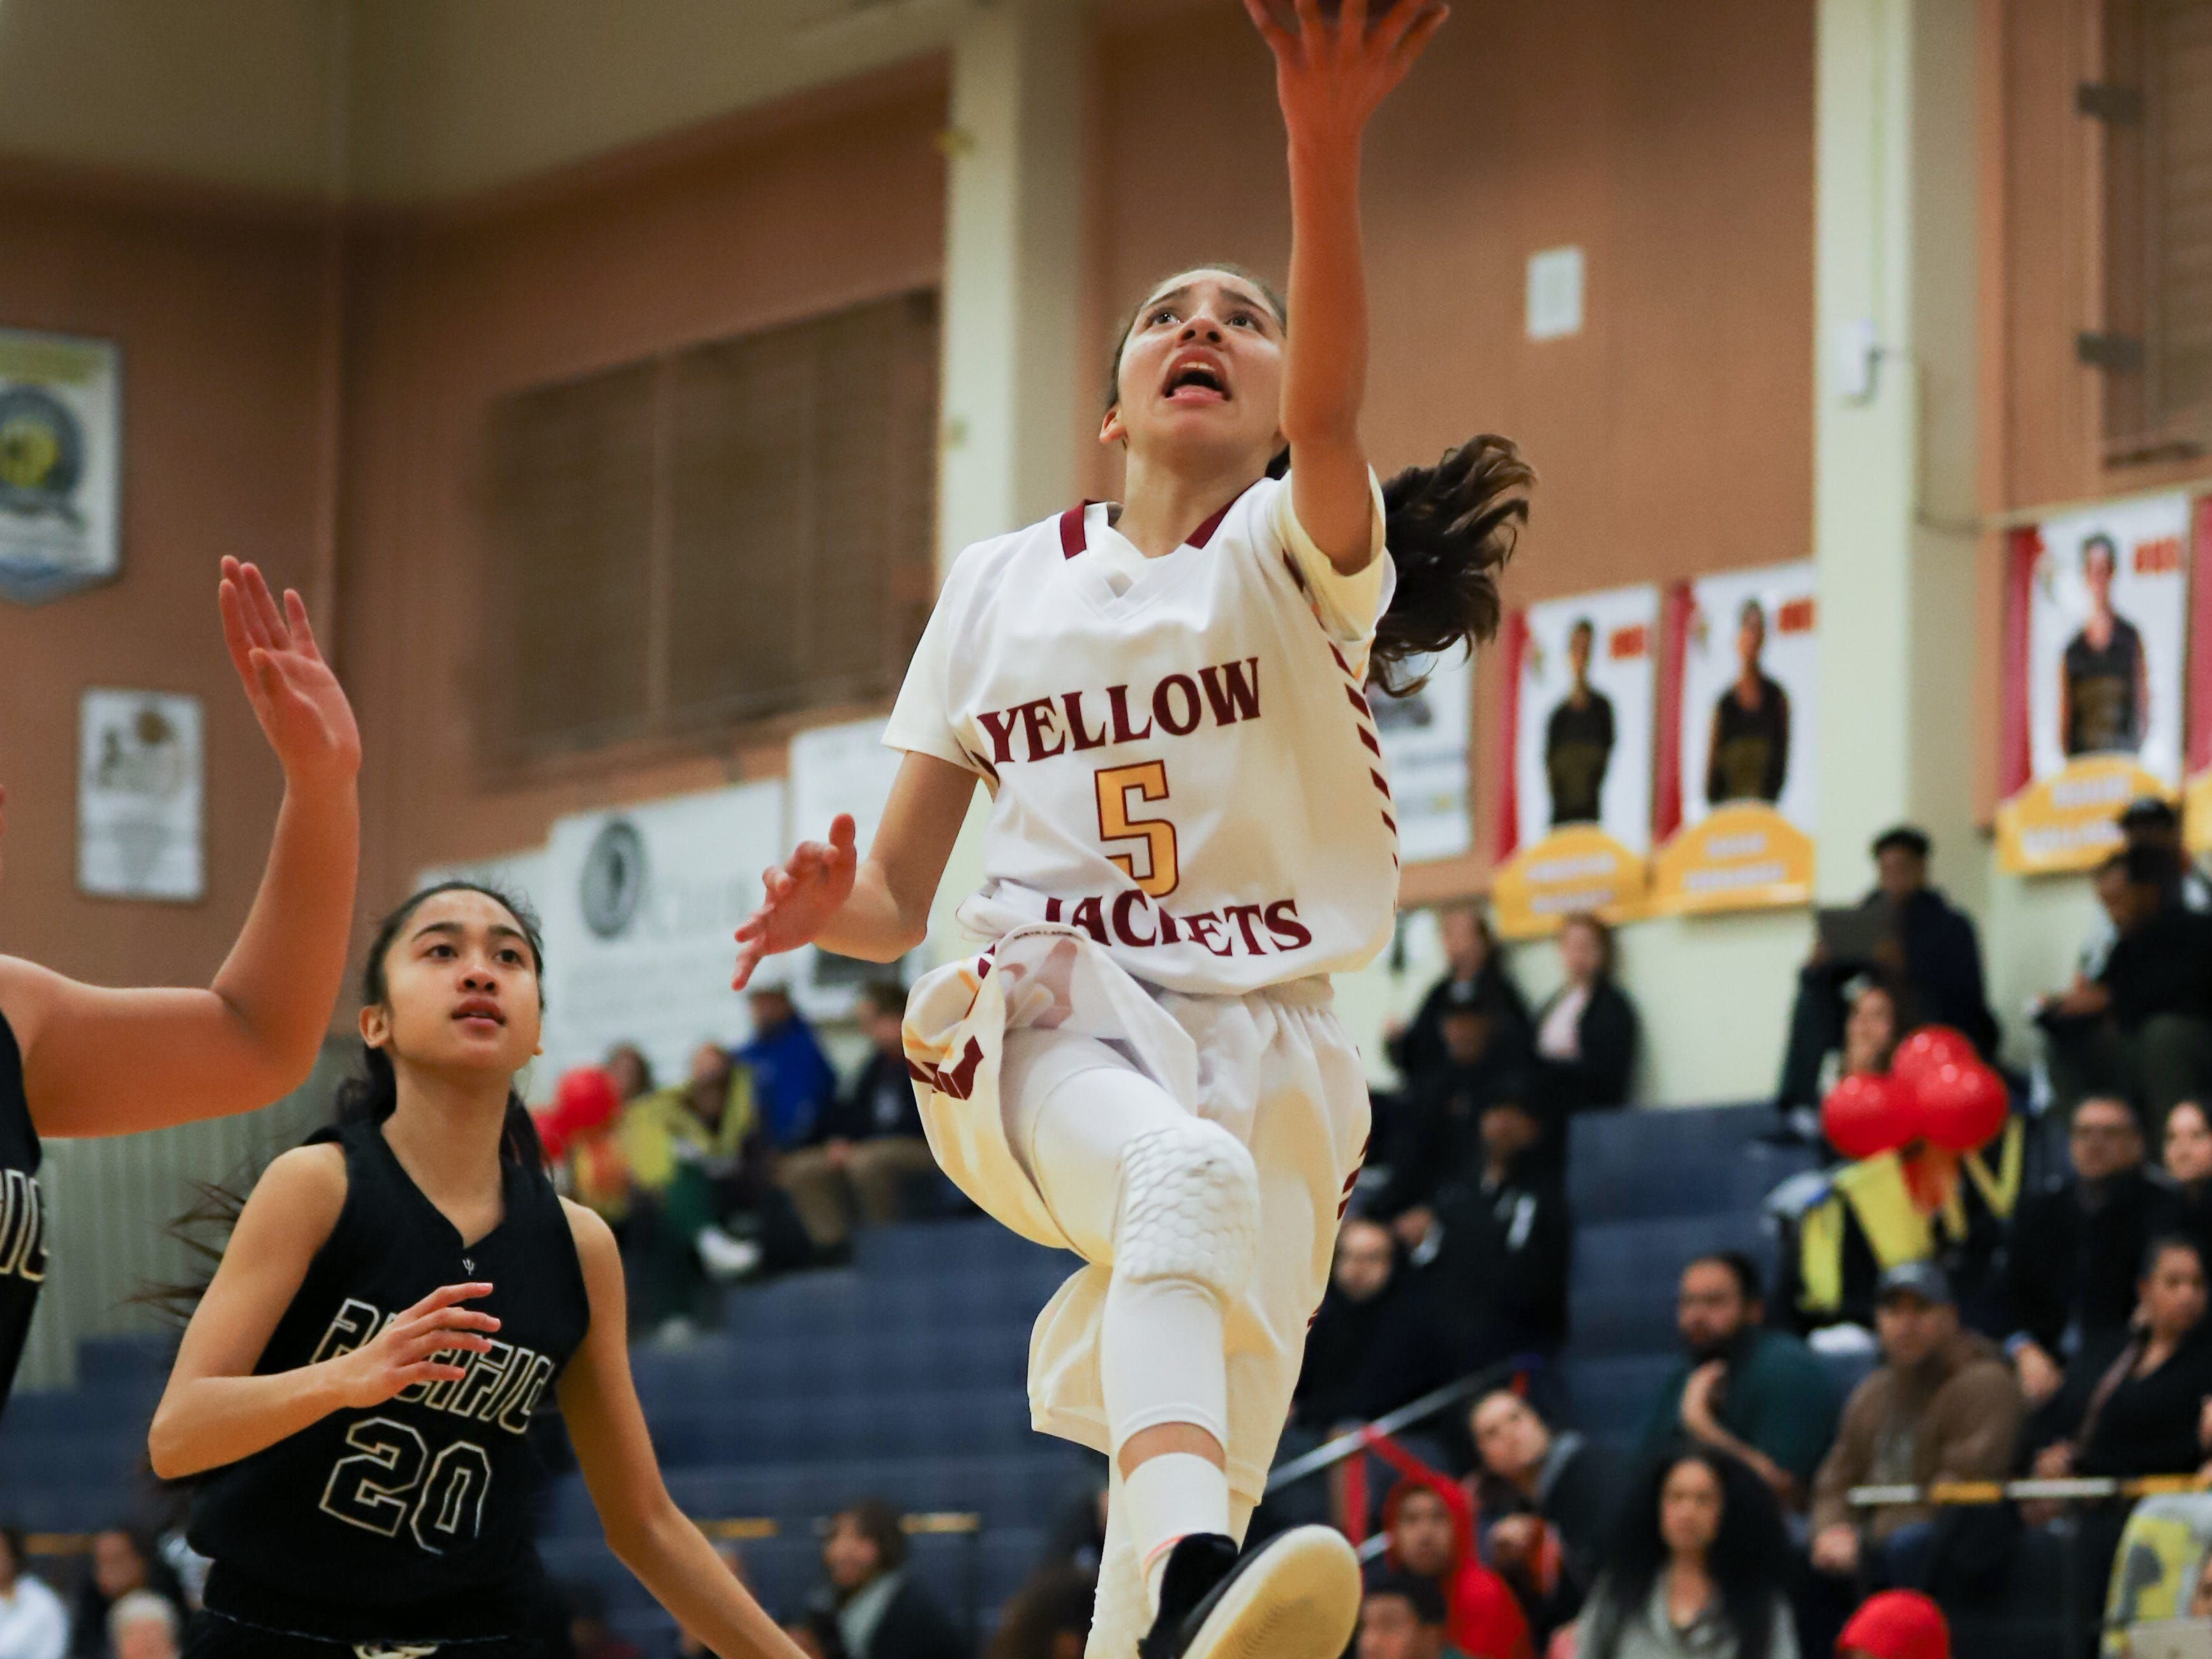 Freshman Samantha McKenzie has played like a seasoned veteran for Oxnard High.